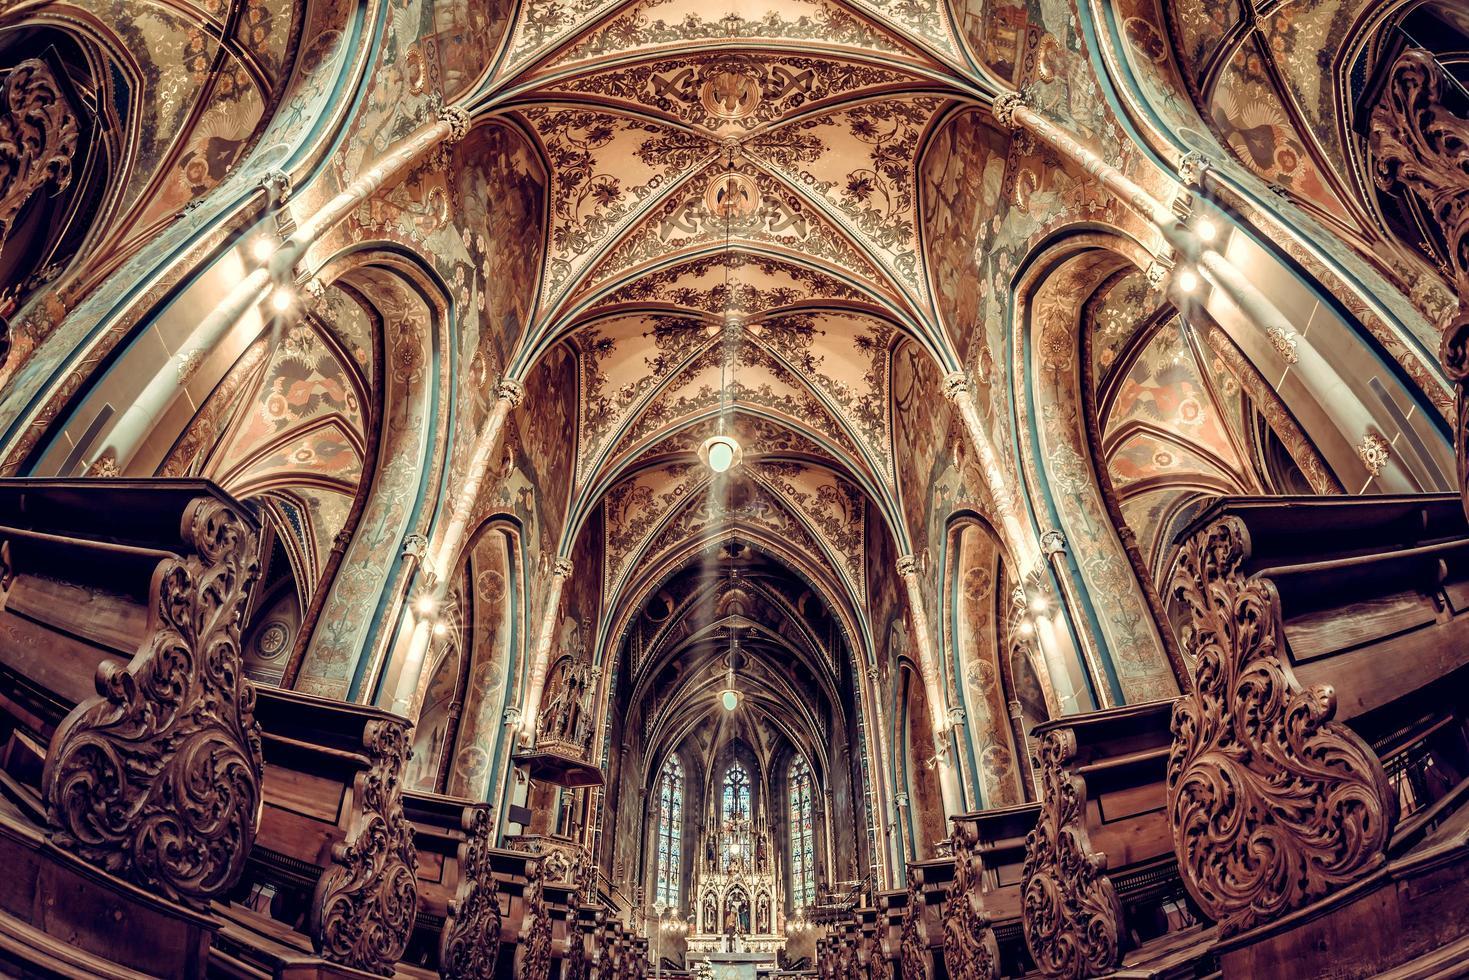 interieur van de basiliek van st. peter en paul foto